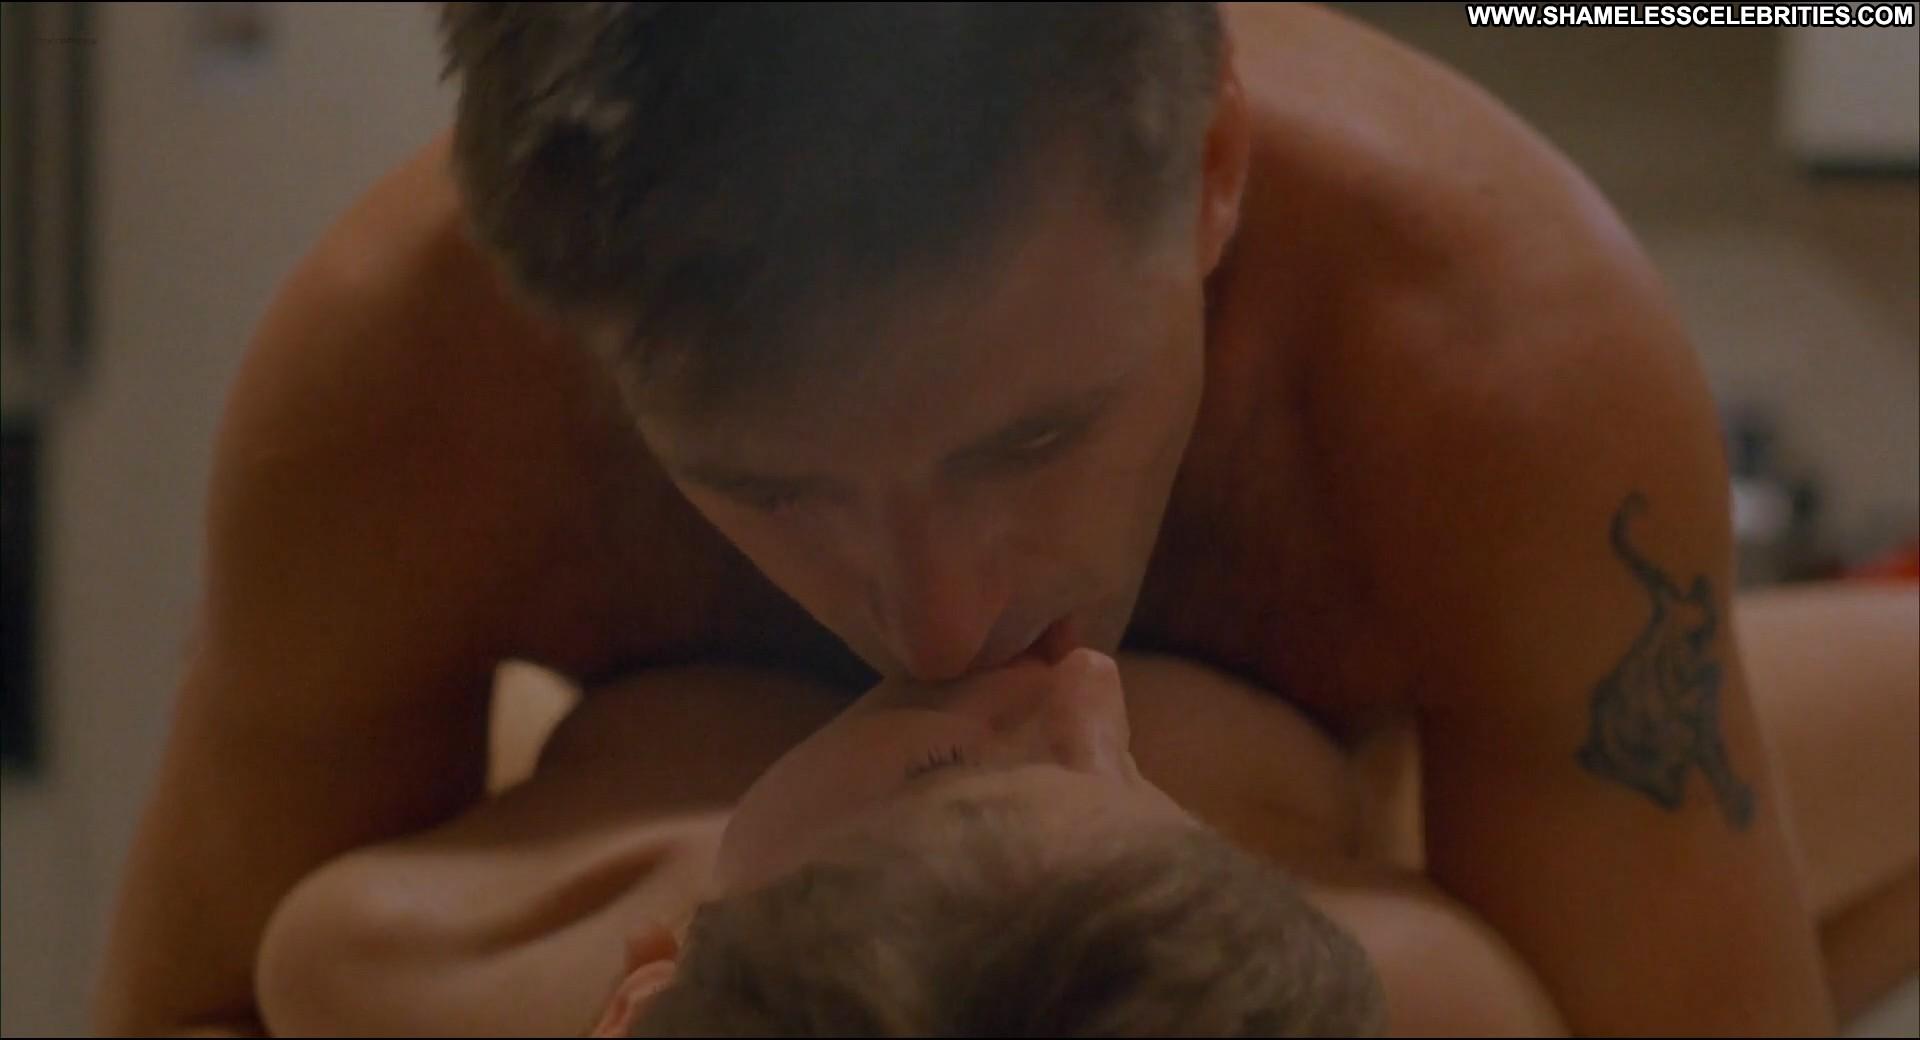 Alec baldwin slams dumb paris hilton for making sex tape